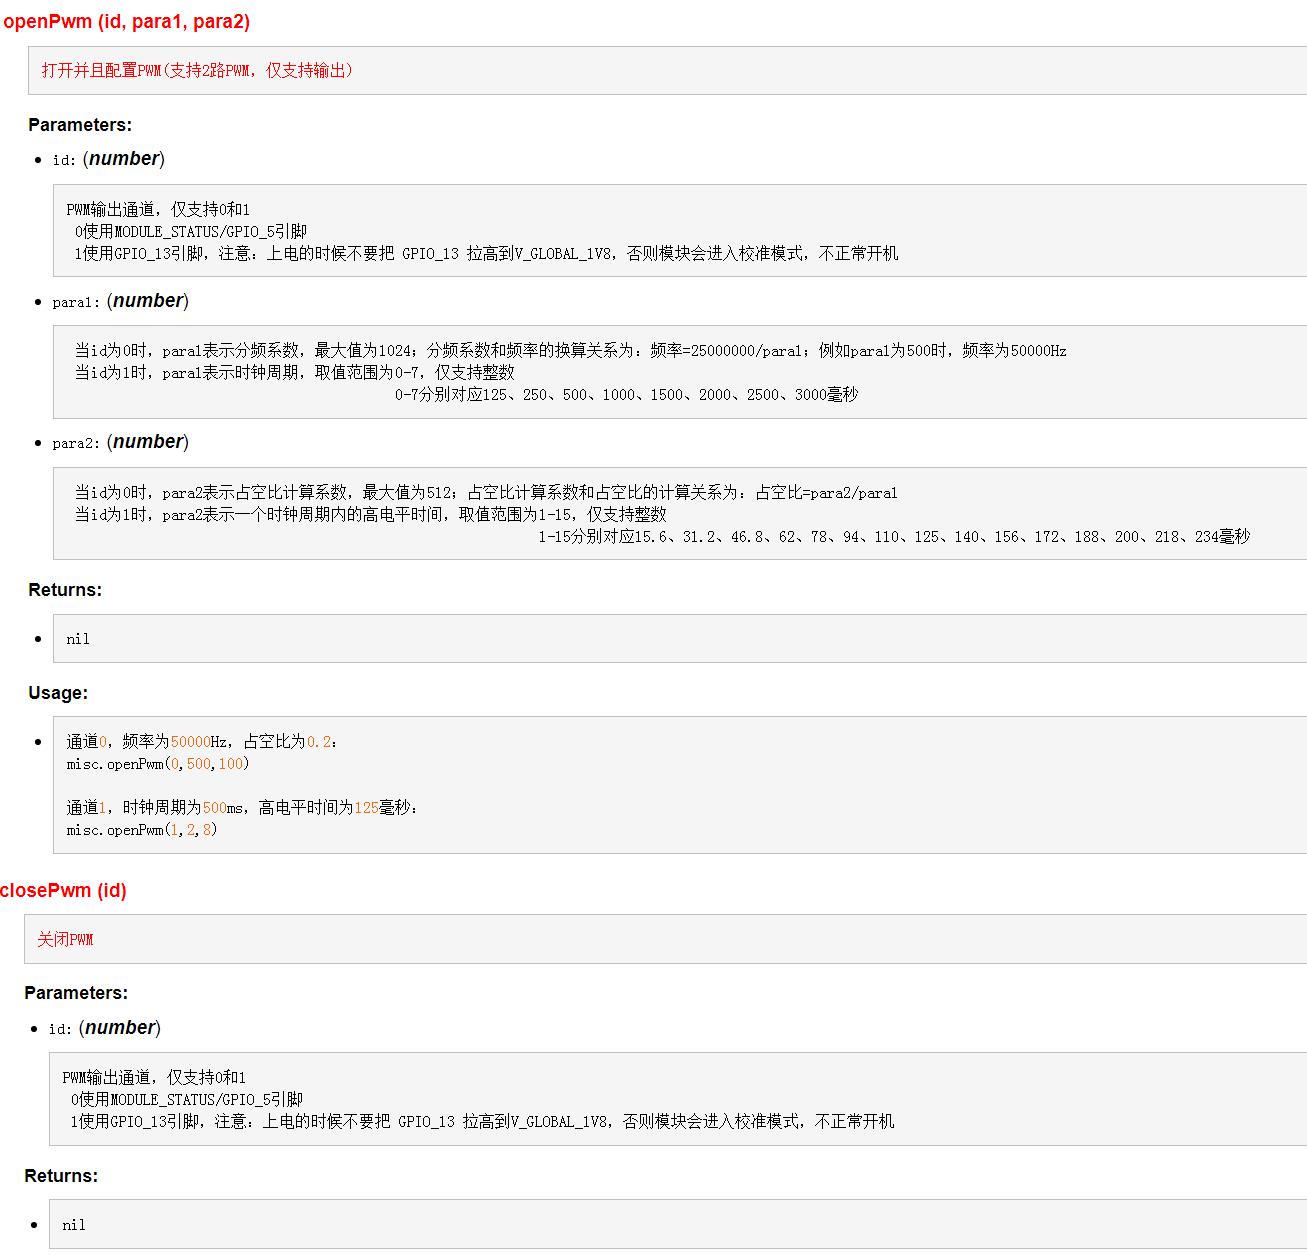 http://openluat-luatcommunity.oss-cn-hangzhou.aliyuncs.com/images/20200726172543091_closePwm.png